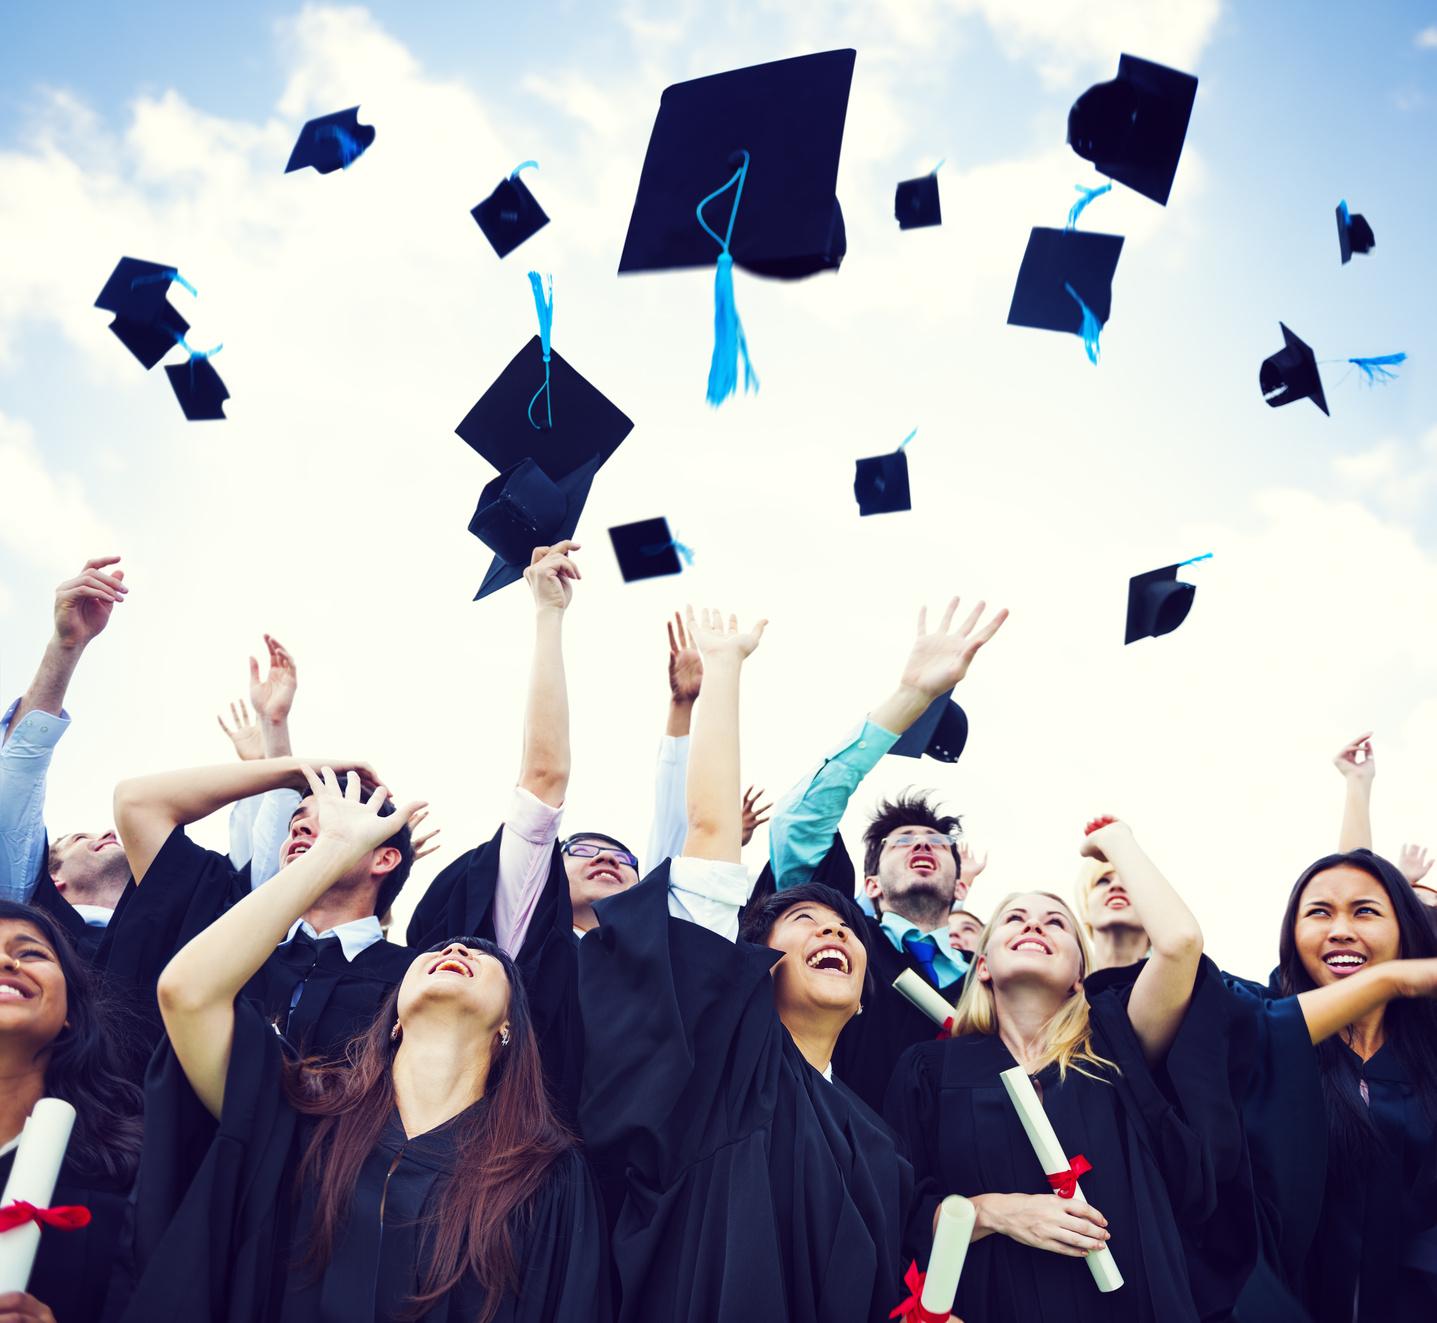 Tips for a Safe Graduation